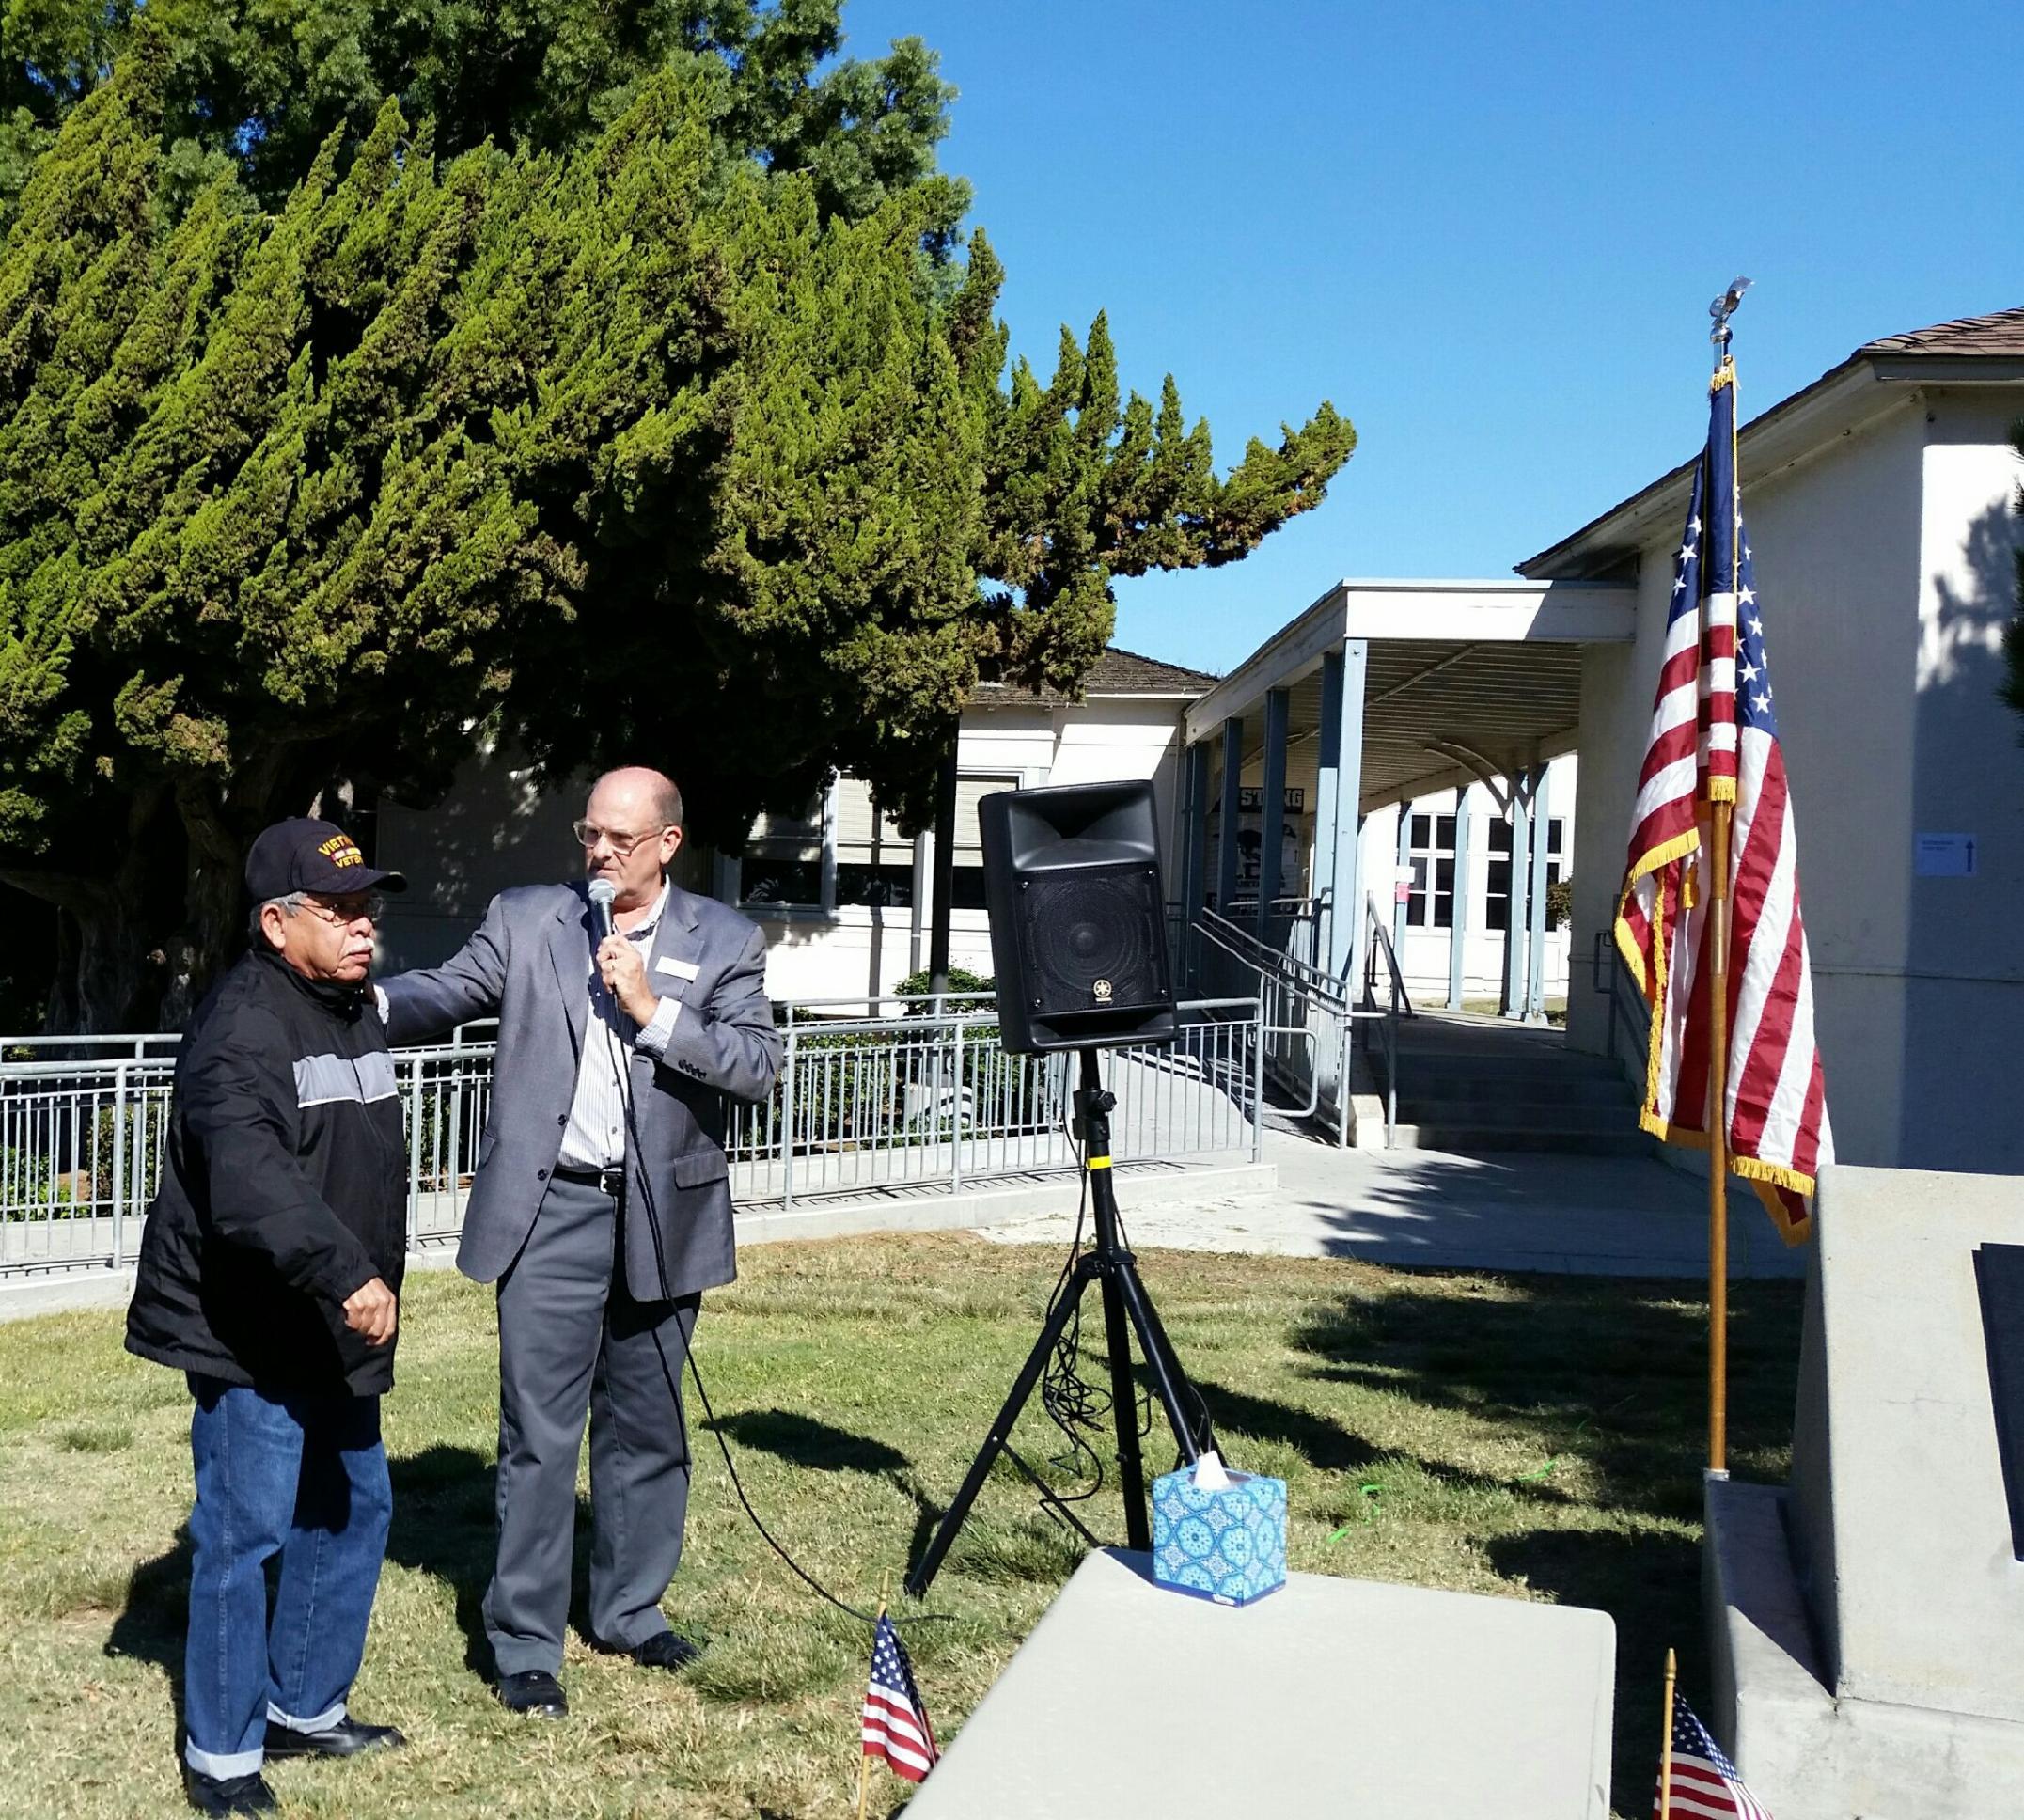 David and Ken in front of the memorial